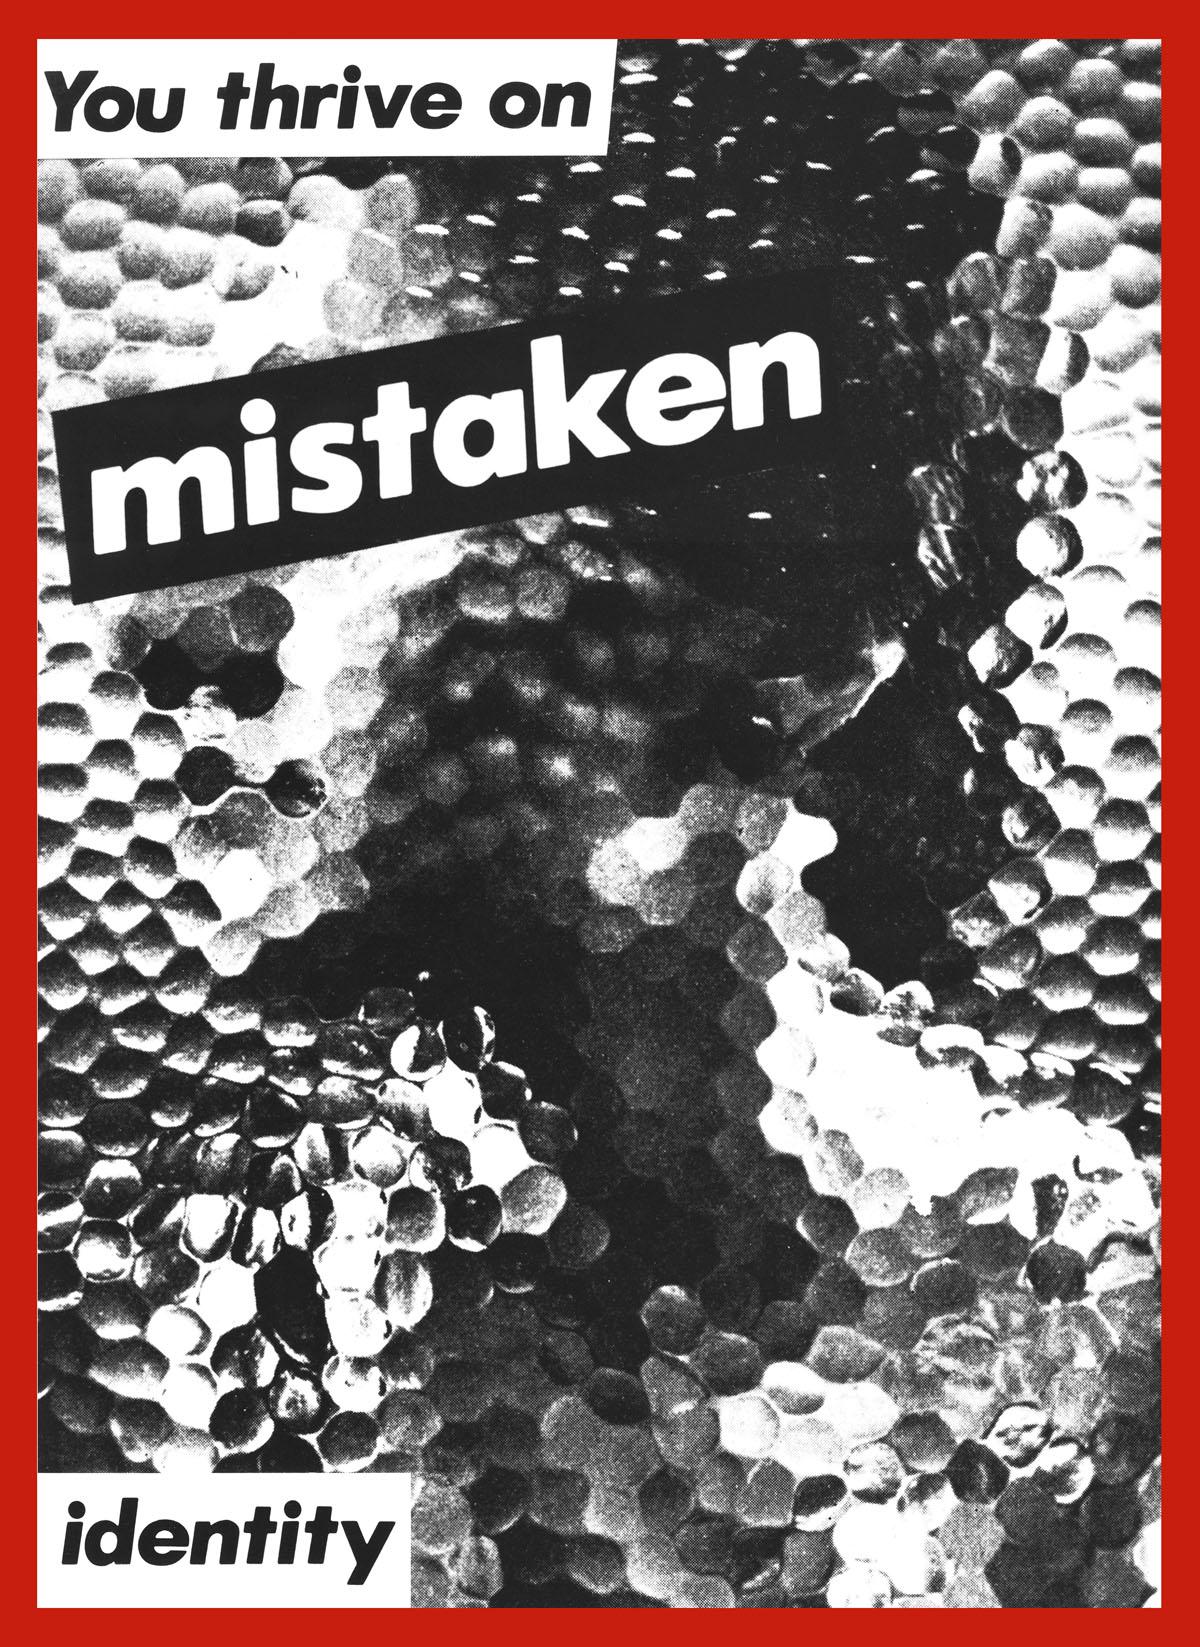 barbara kruger you thrive on mistaken identity art blart untitled you thrive on mistaken identity 1981